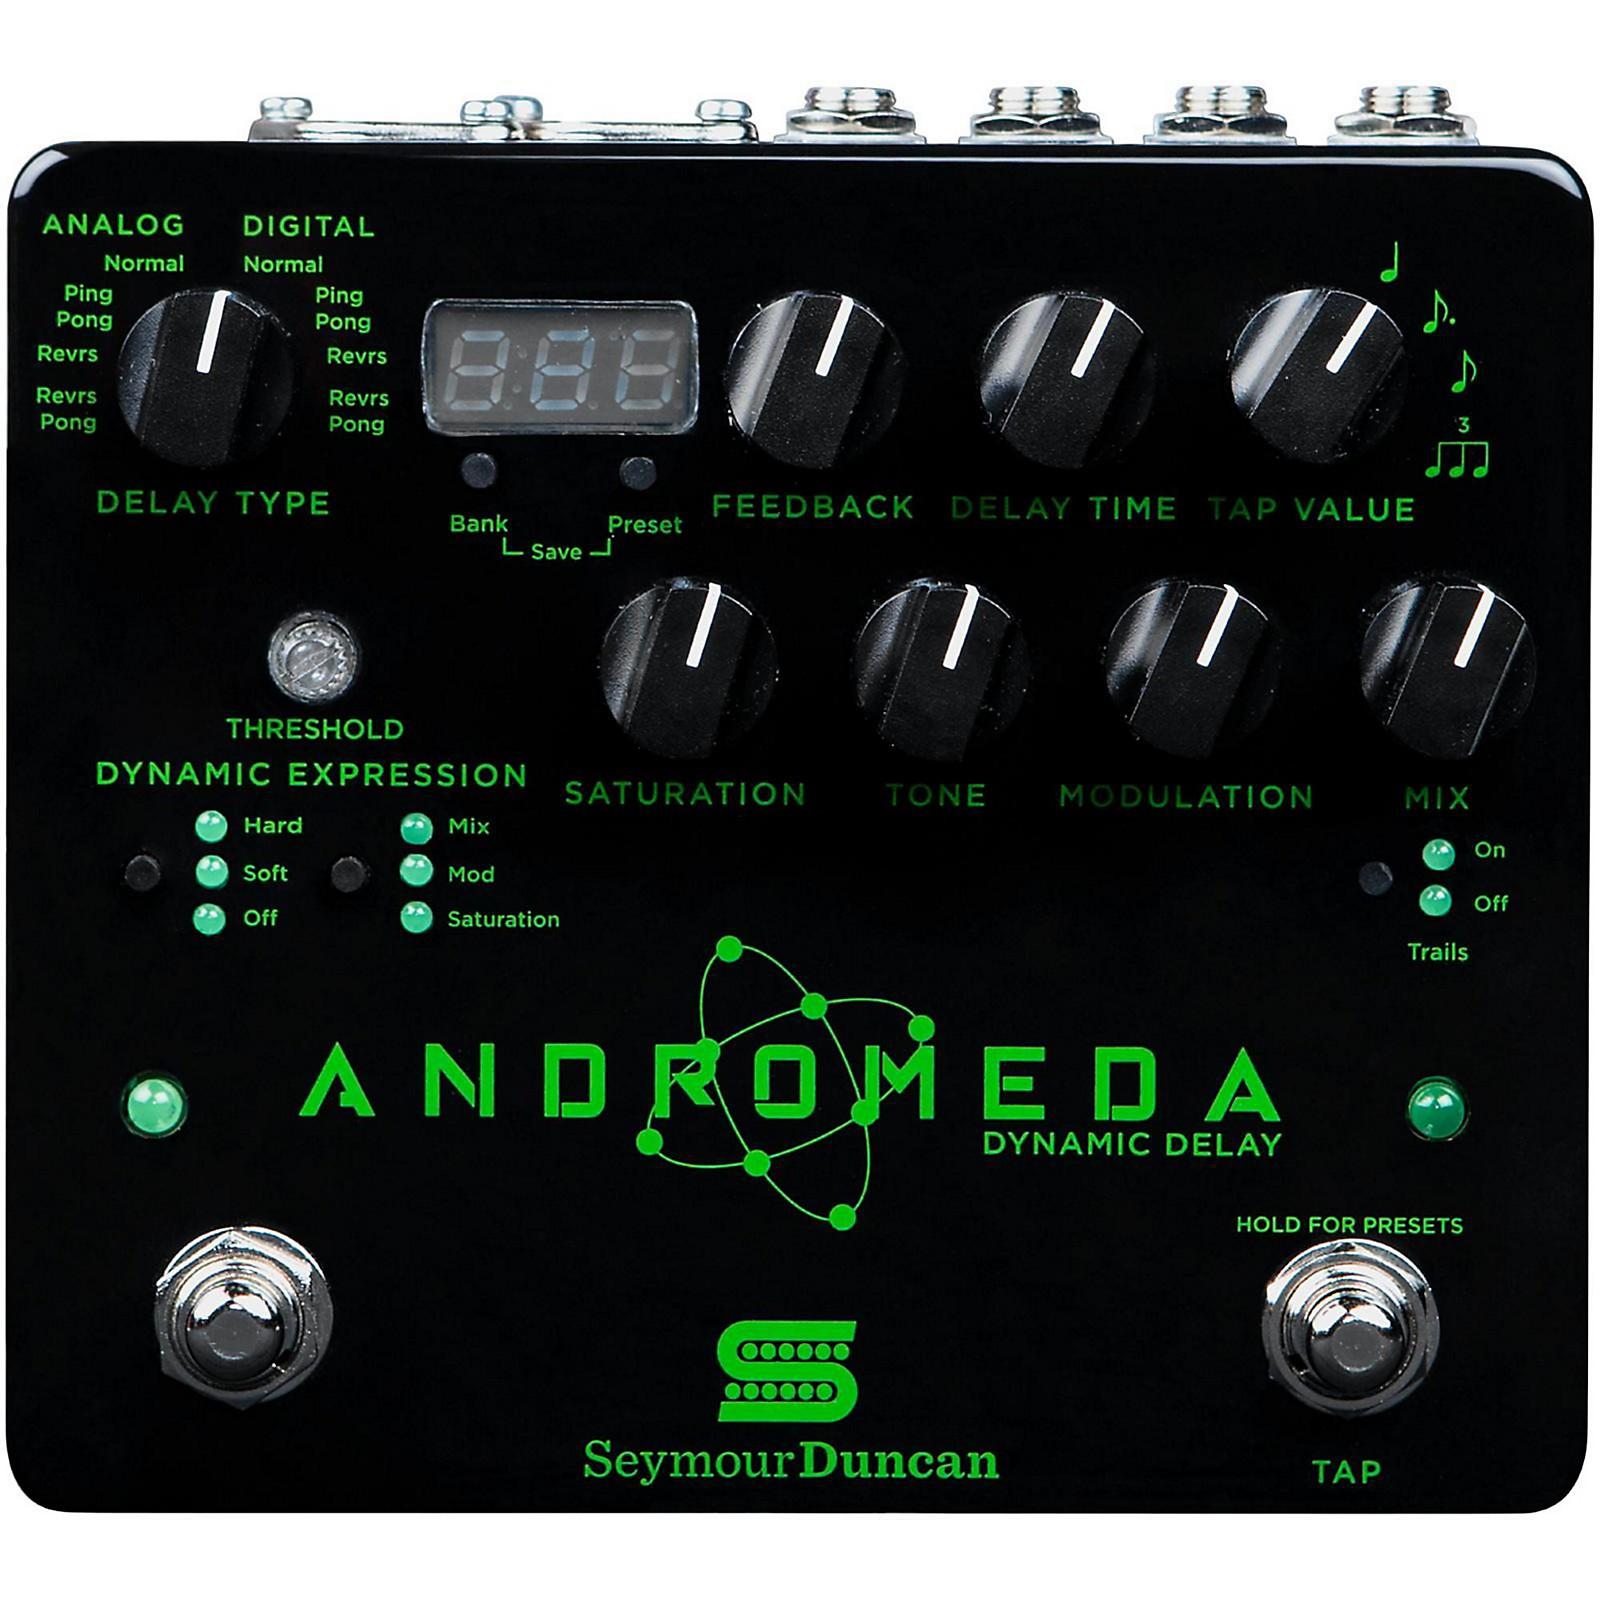 Seymour Duncan Andromeda Dynamic Delay Pedal